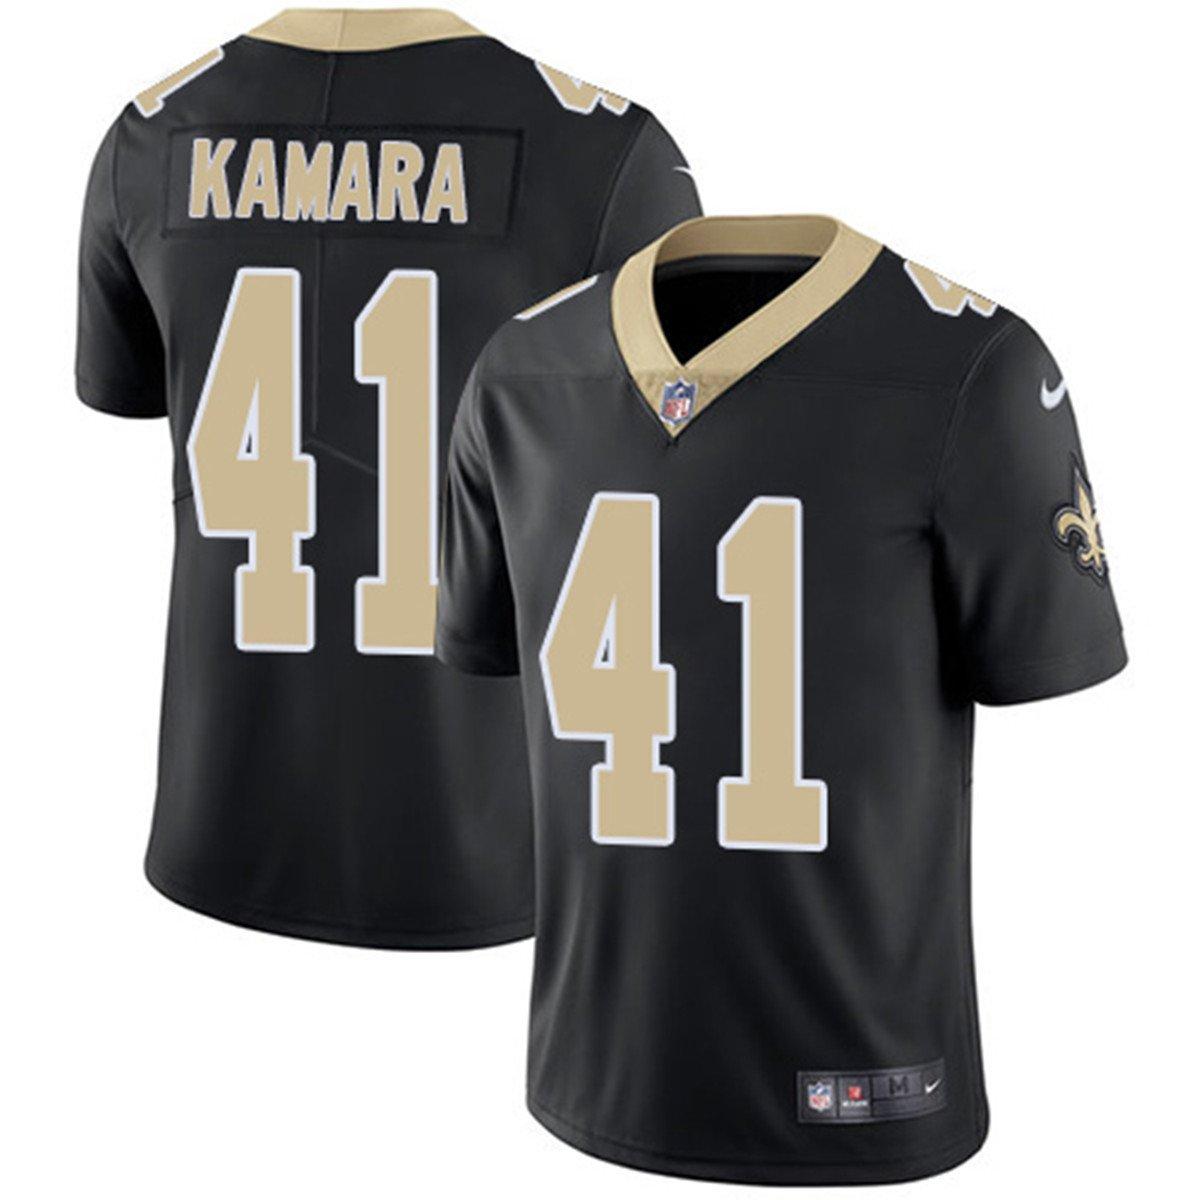 the best attitude aa7ae 671de Amazon.com: NIKE Men's Alvin Kamara 41 New Orleans Saints ...